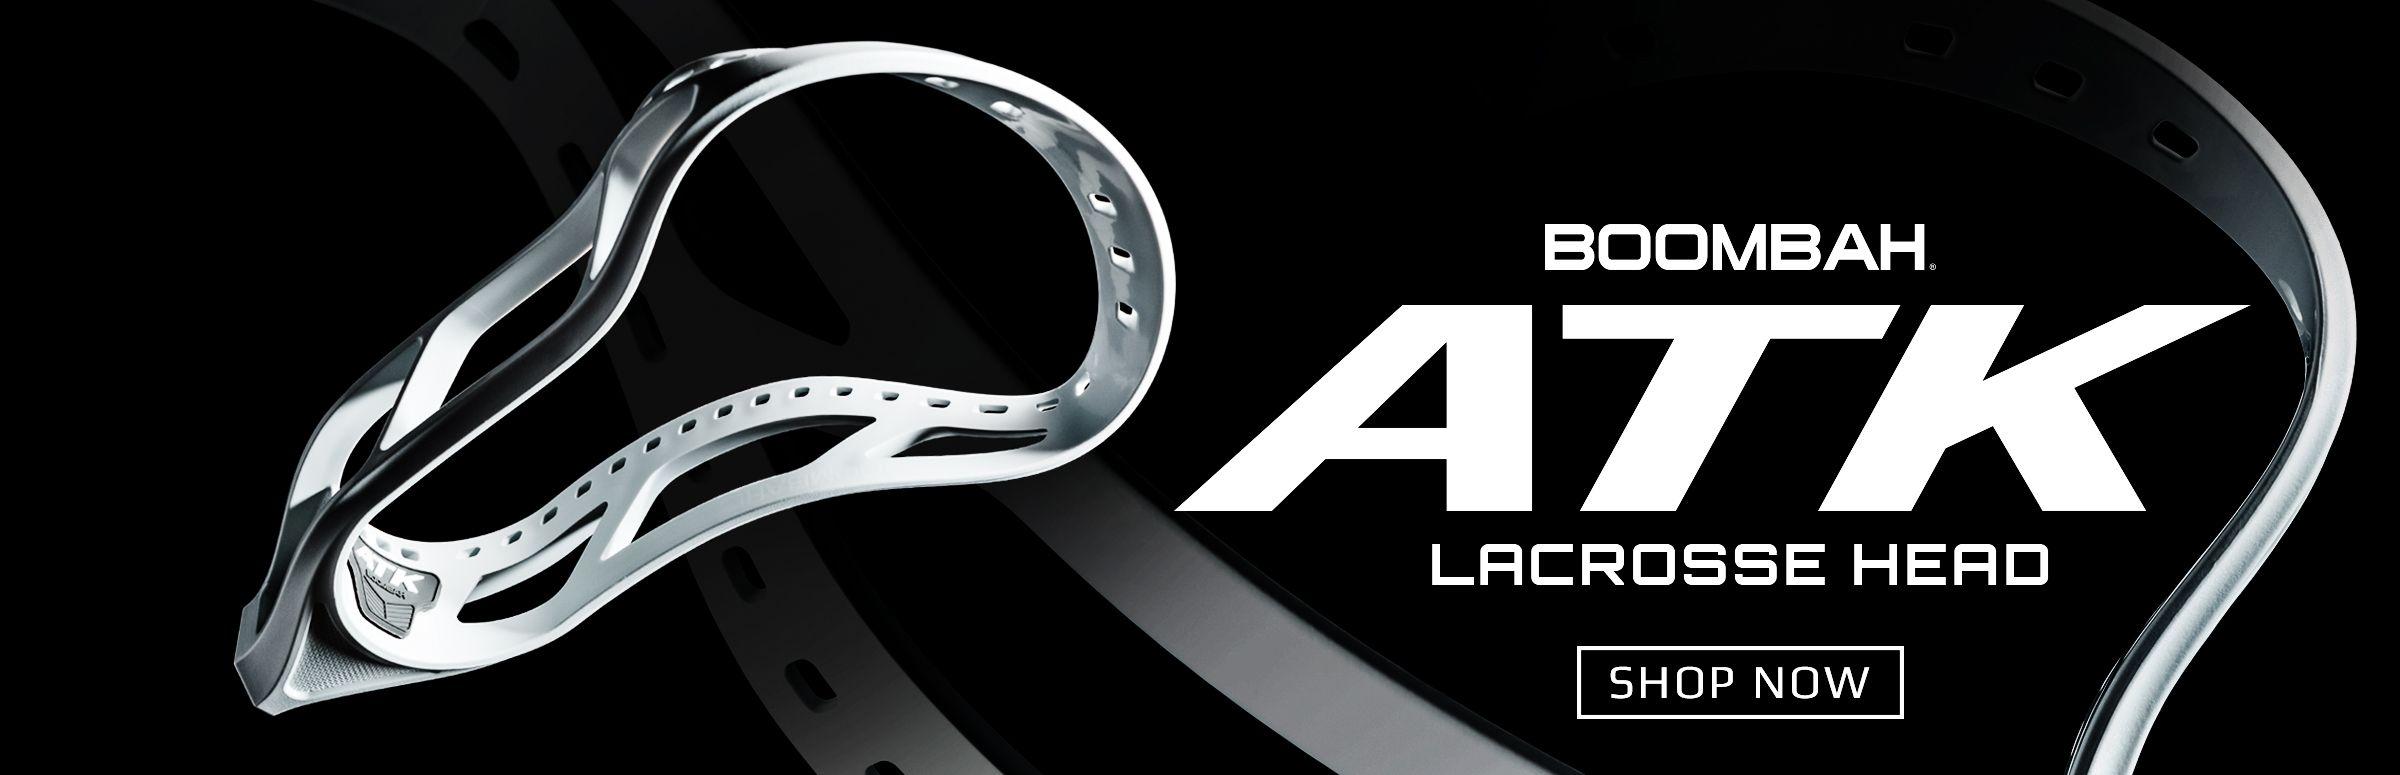 Boombah Lacrosse ATK Head Unstrung